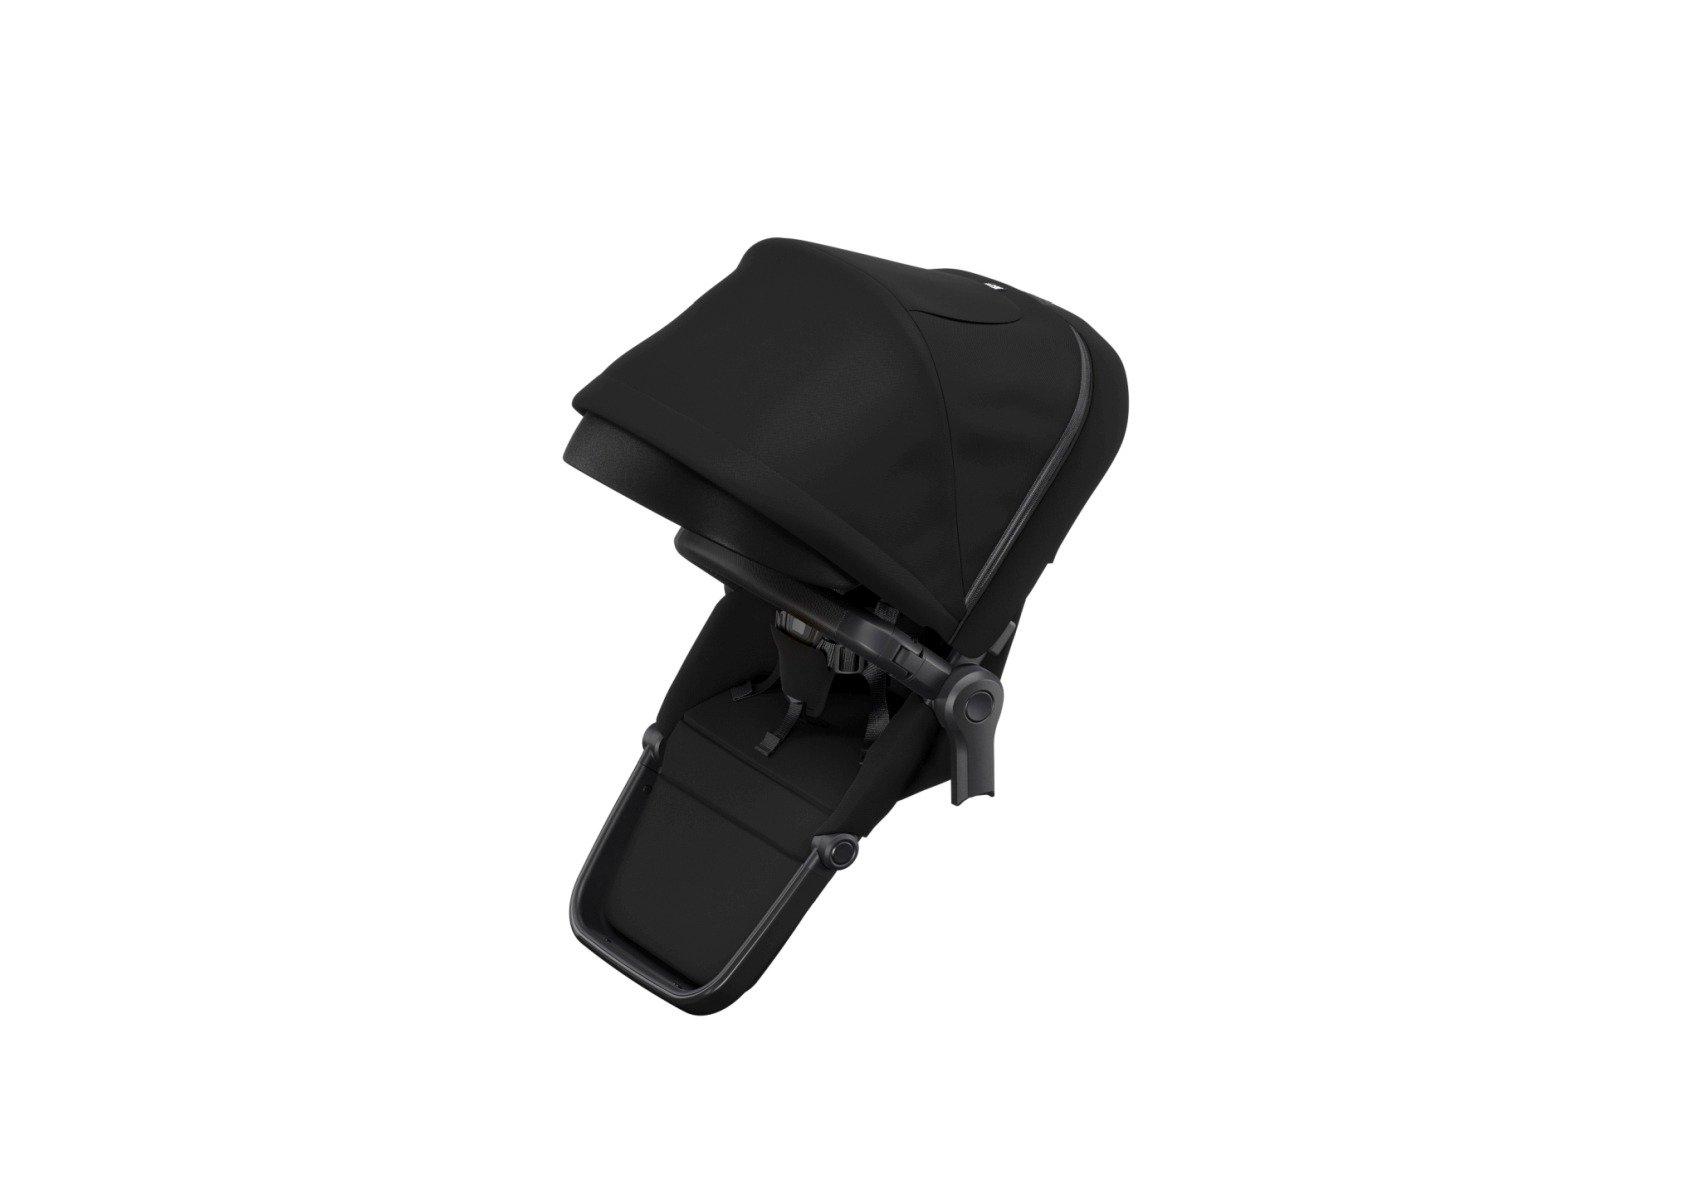 Thule - Sleek Black on Black - dodatkowe siedzisko